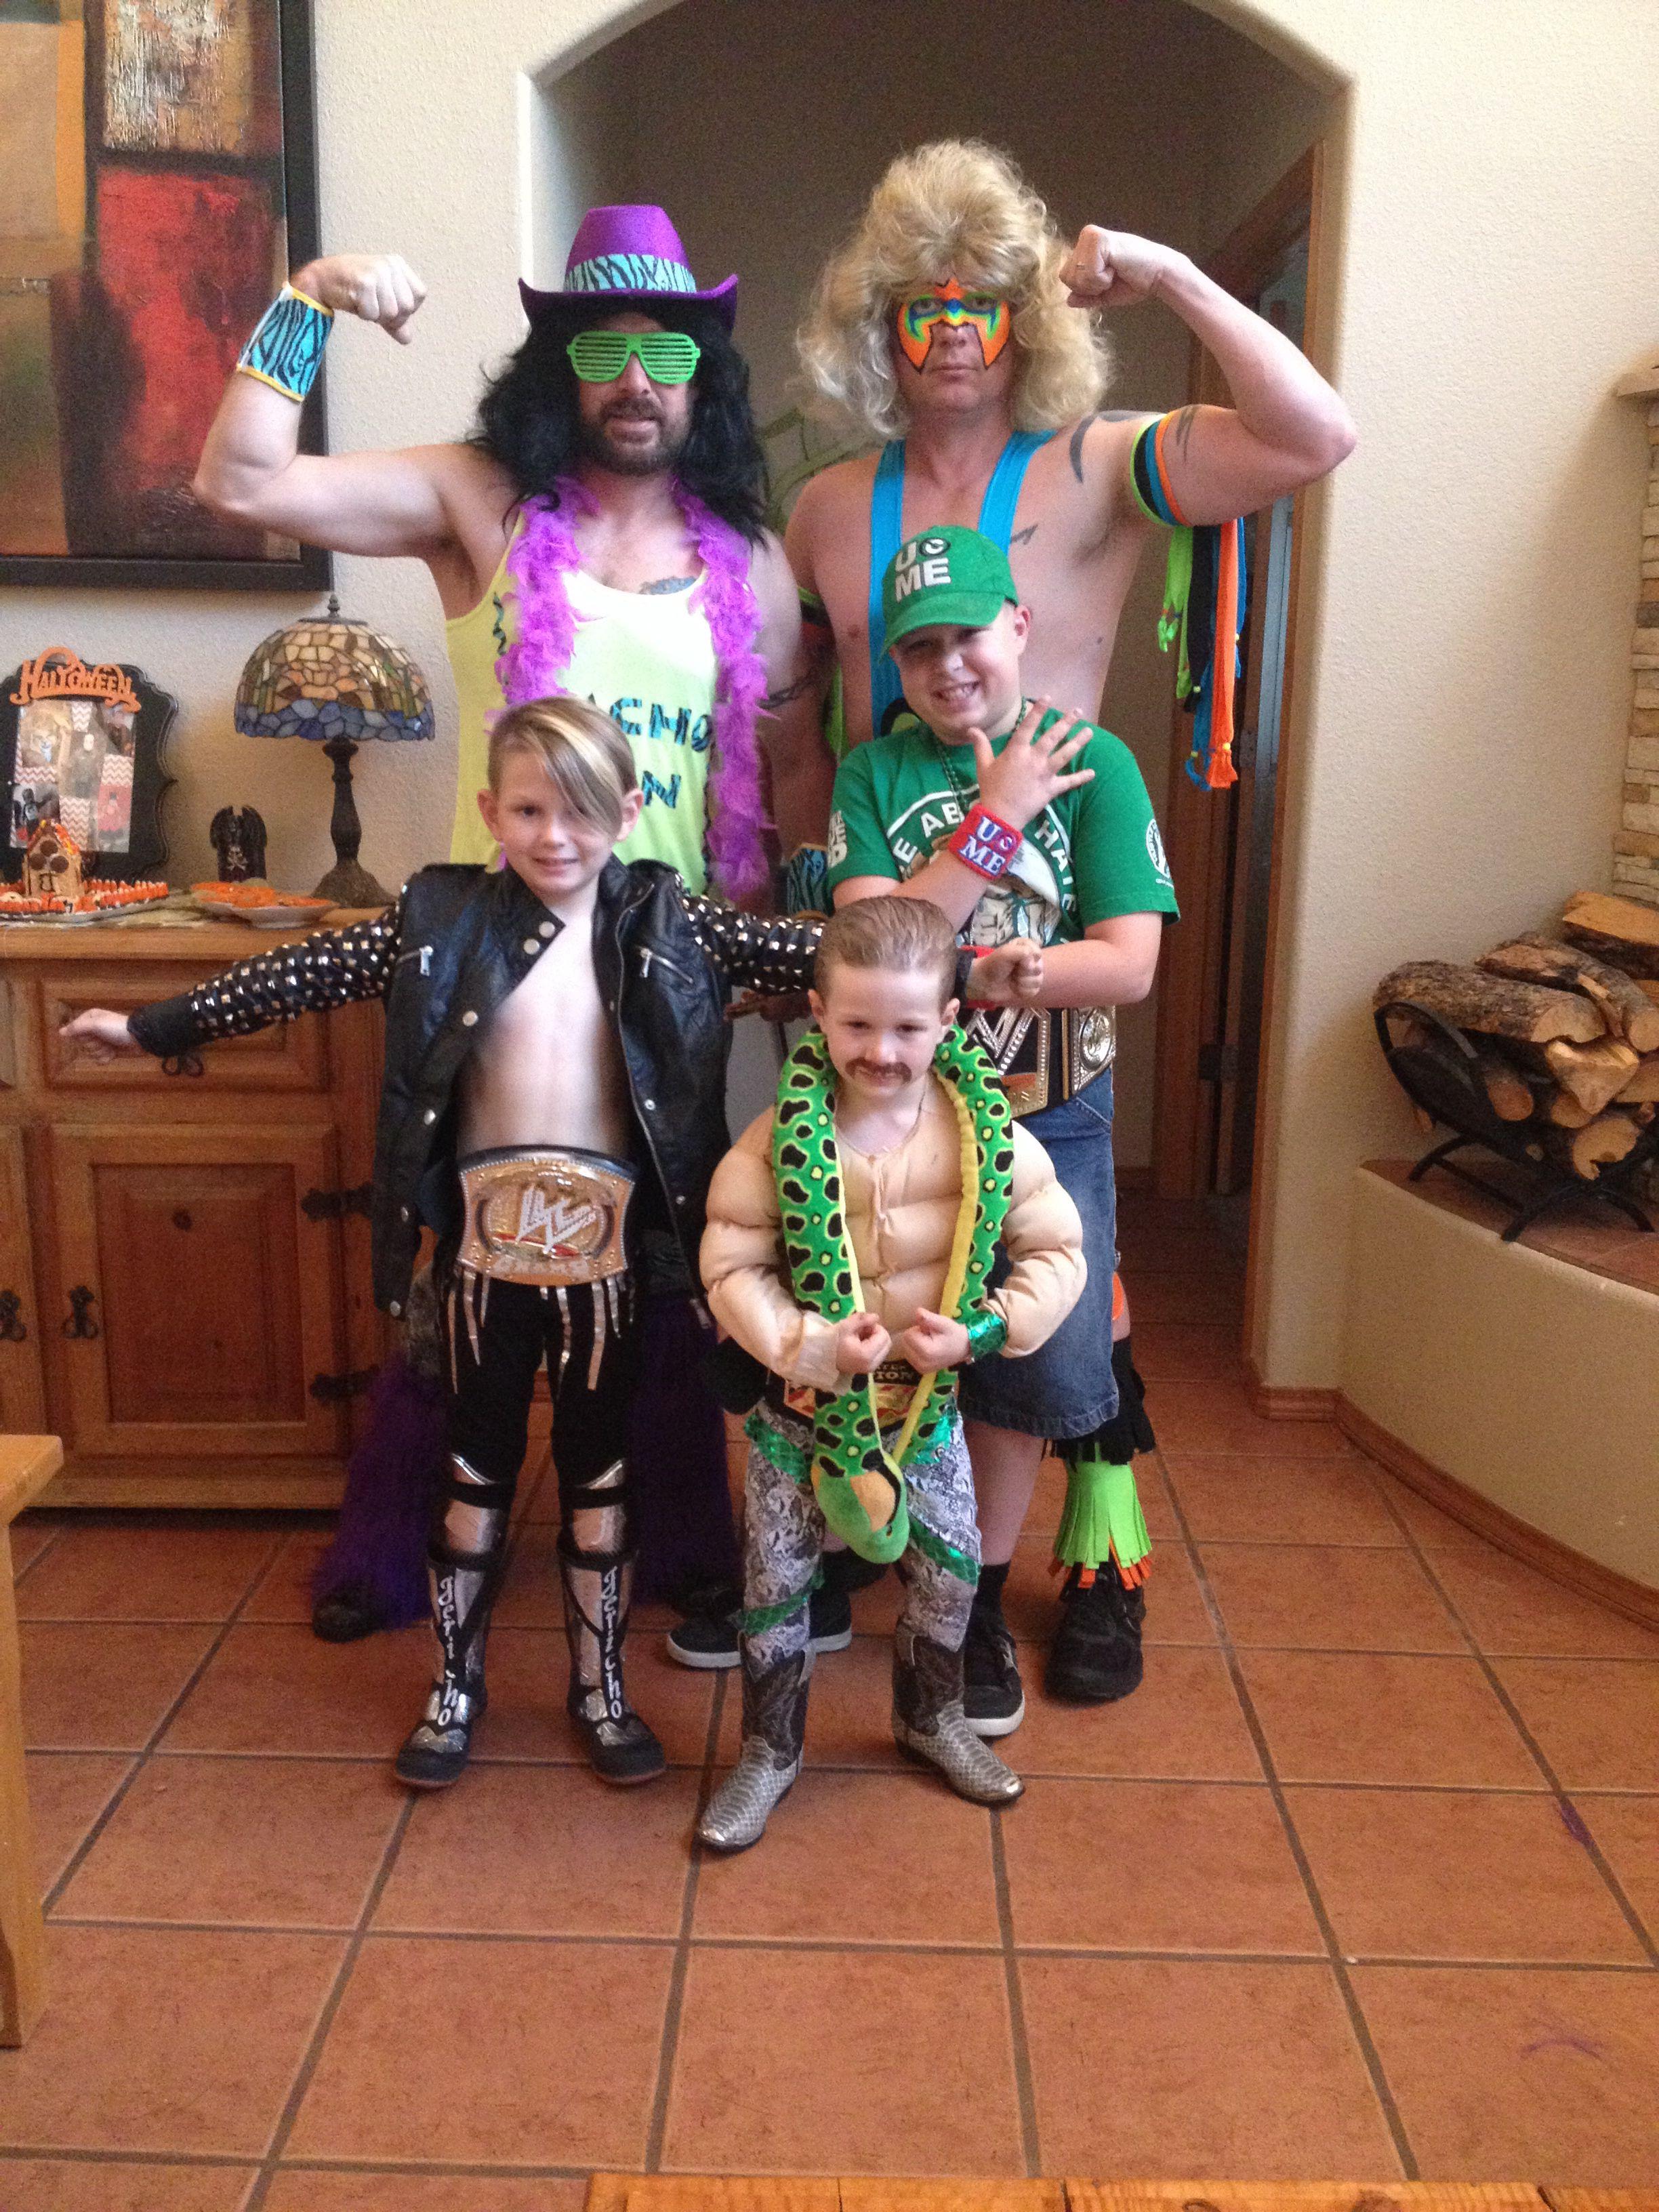 wwe halloween costumes chris jericho jake the snake roberts john cena ultimate warrior macho man randy savage